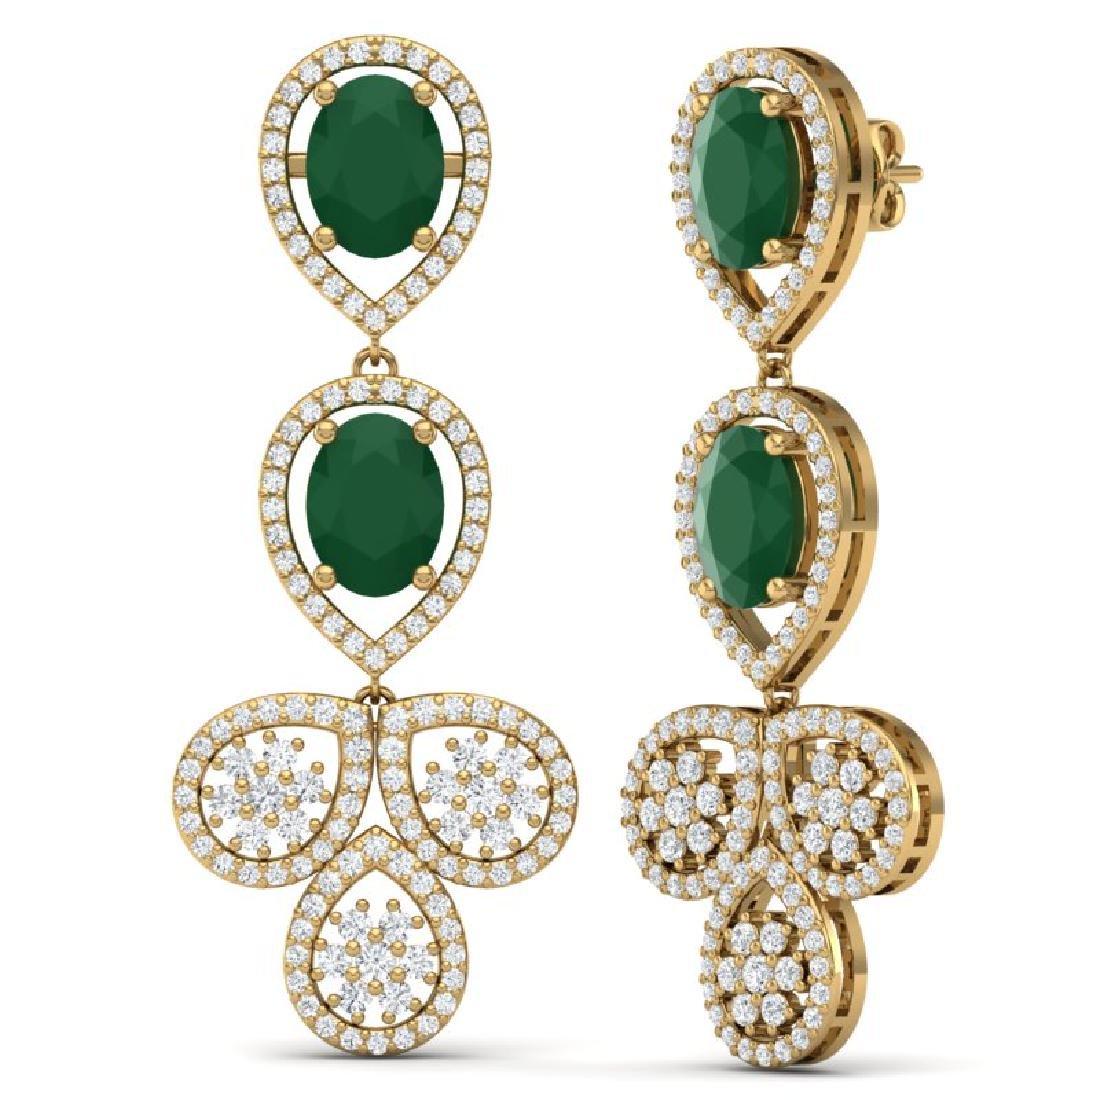 9.75 CTW Royalty Emerald & VS Diamond Earrings 18K - 3